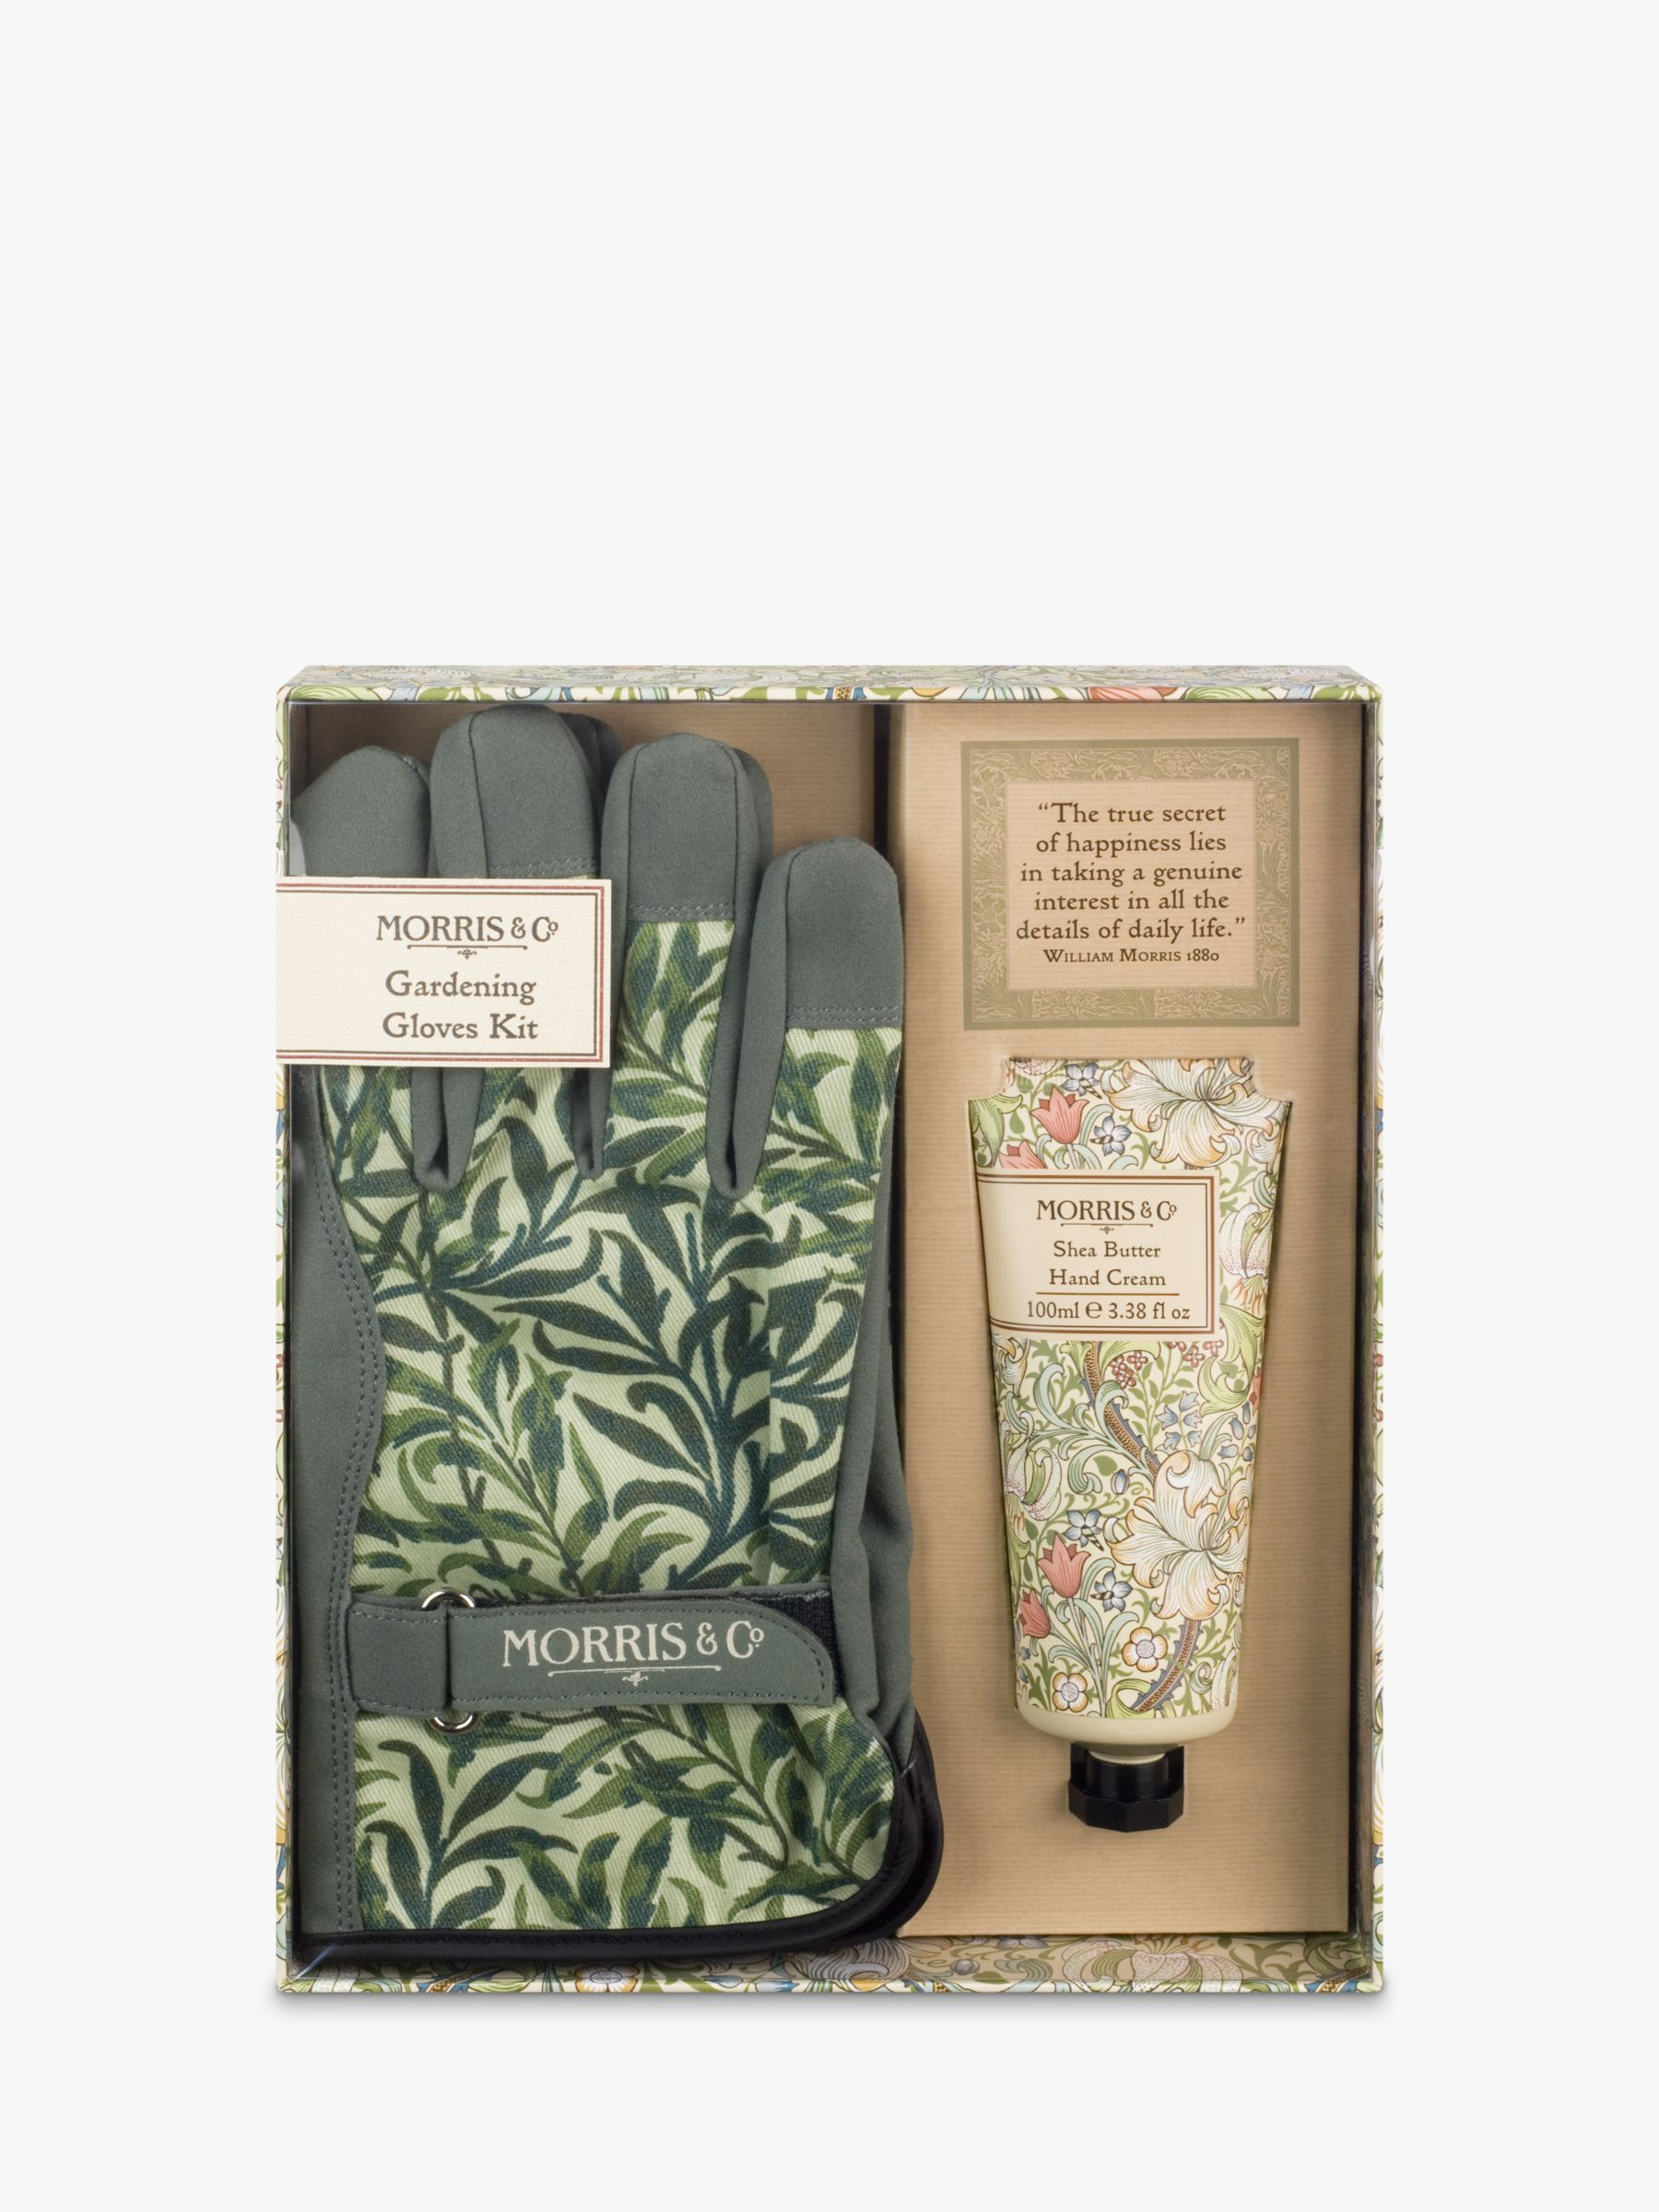 Morris & Co Morris & Co Gardening Gloves and Hand Cream Gift Set